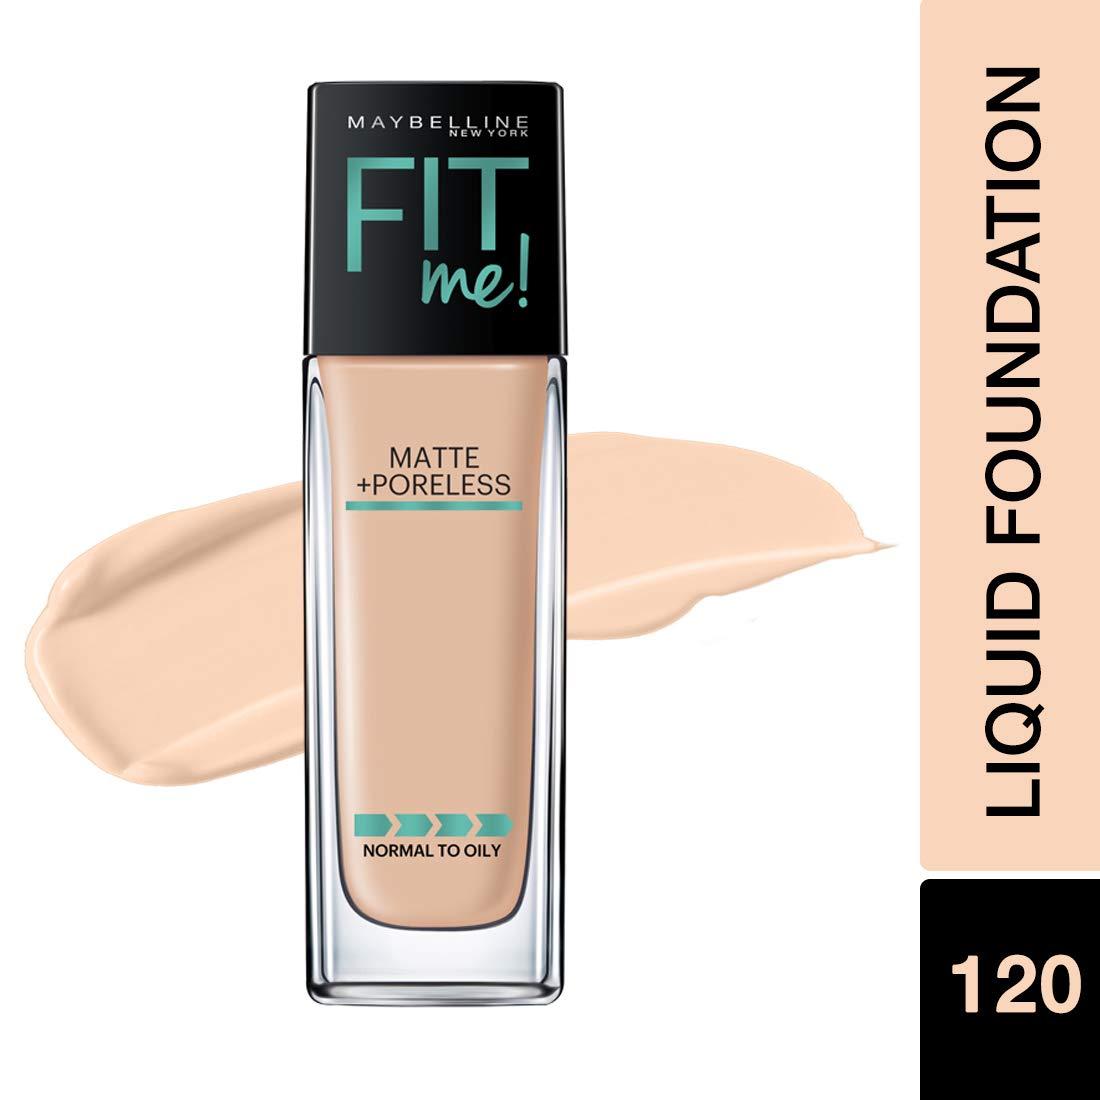 871425553e8 Maybelline New York Fit Me Matte Plus Poreless Foundation Makeup, Classic  Ivory, 1 Fluid Ounce: Amazon.ca: Beauty